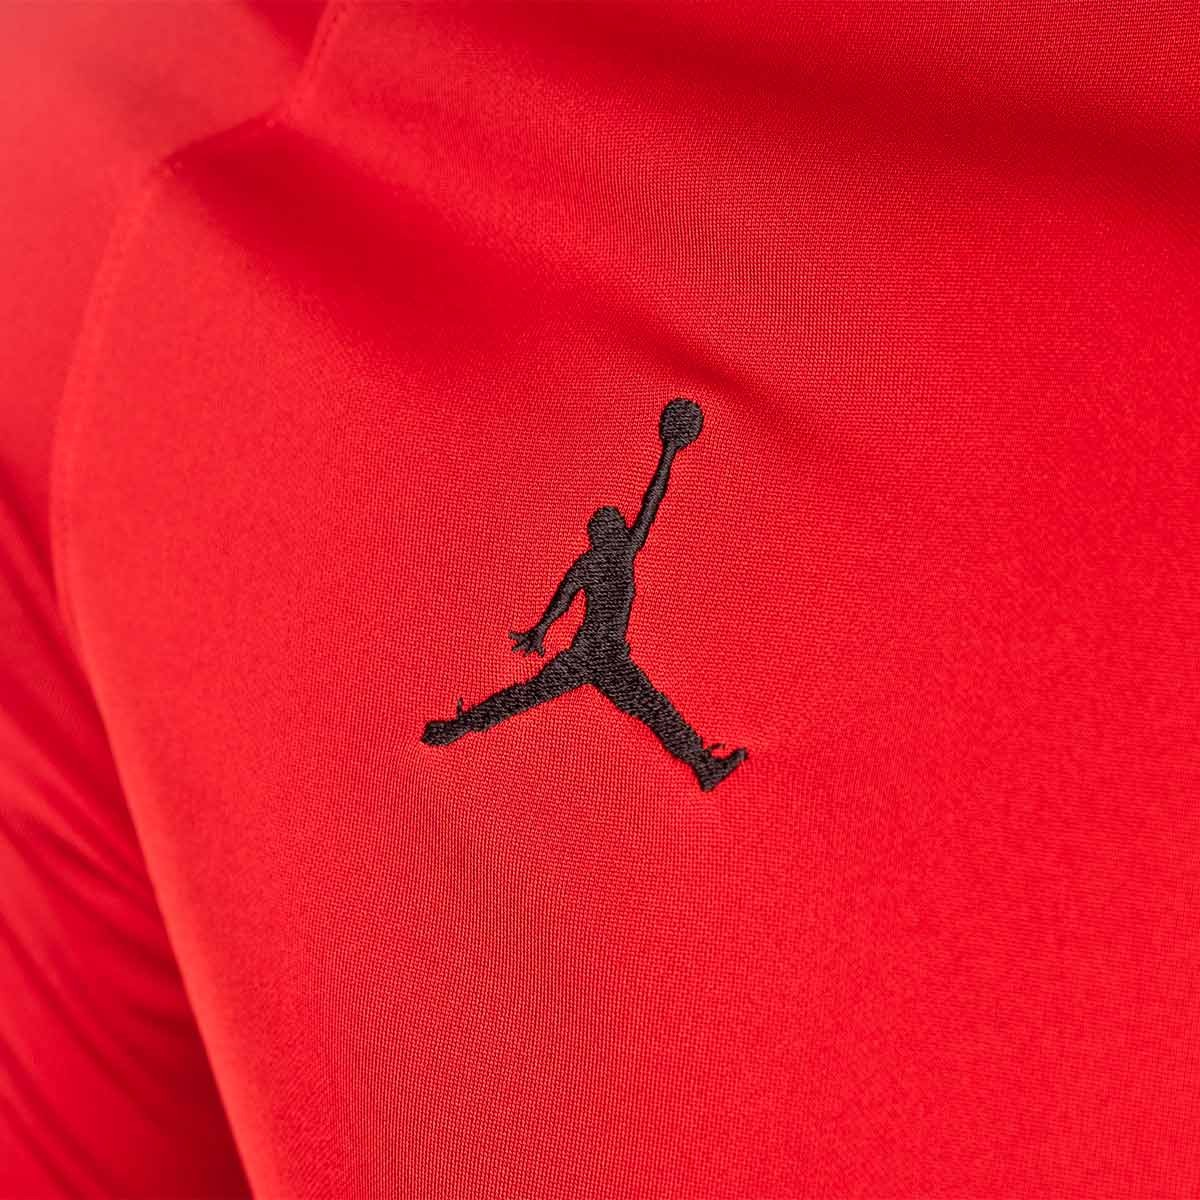 2de7eb60 Camiseta Nike Paris Saint-Germain Dry Squad SS GX2 CL 2018-2019 University  red-Black - Tienda de fútbol Fútbol Emotion